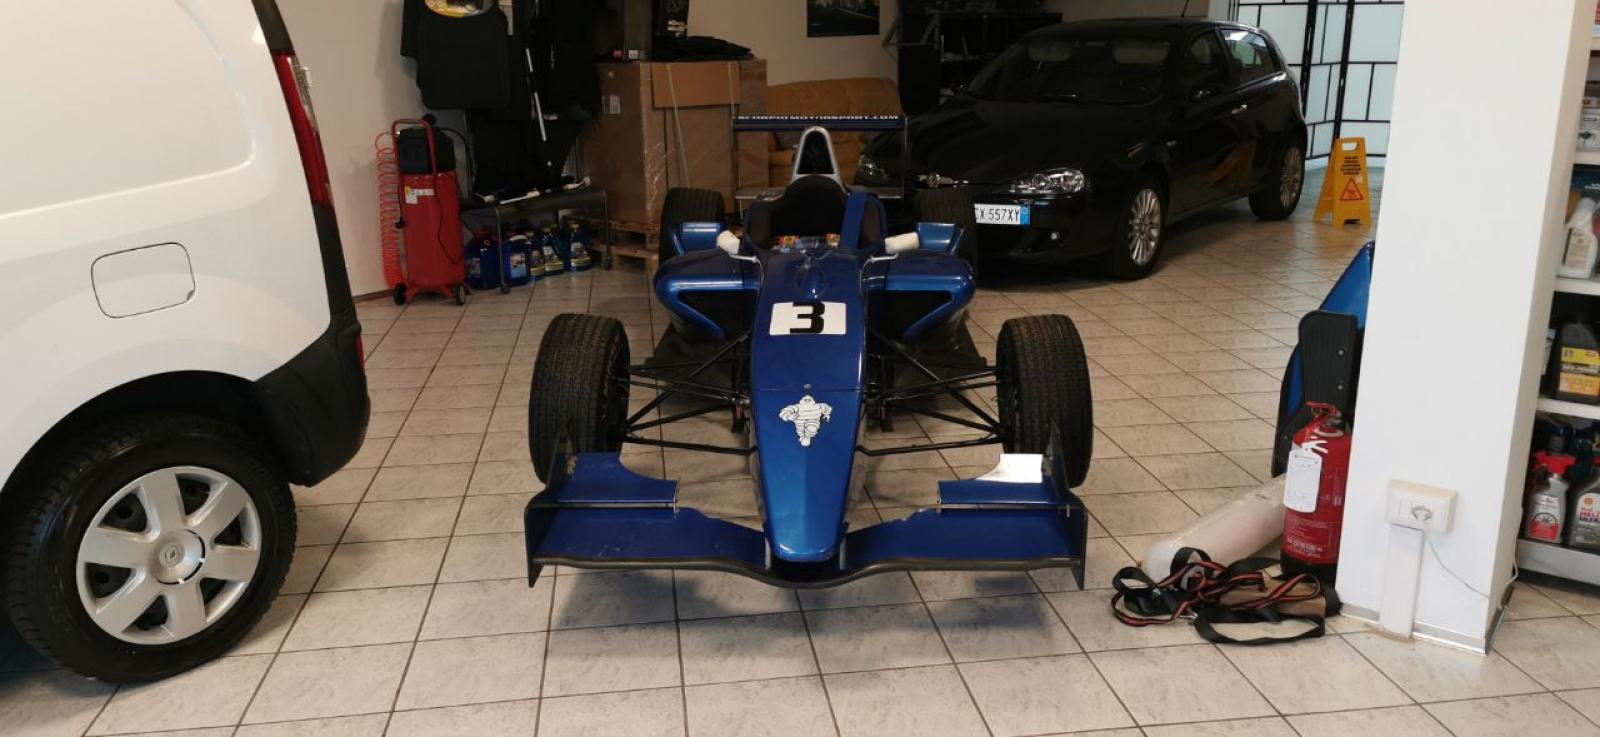 Formula Renault 2.0 2008 Eurocup - 4